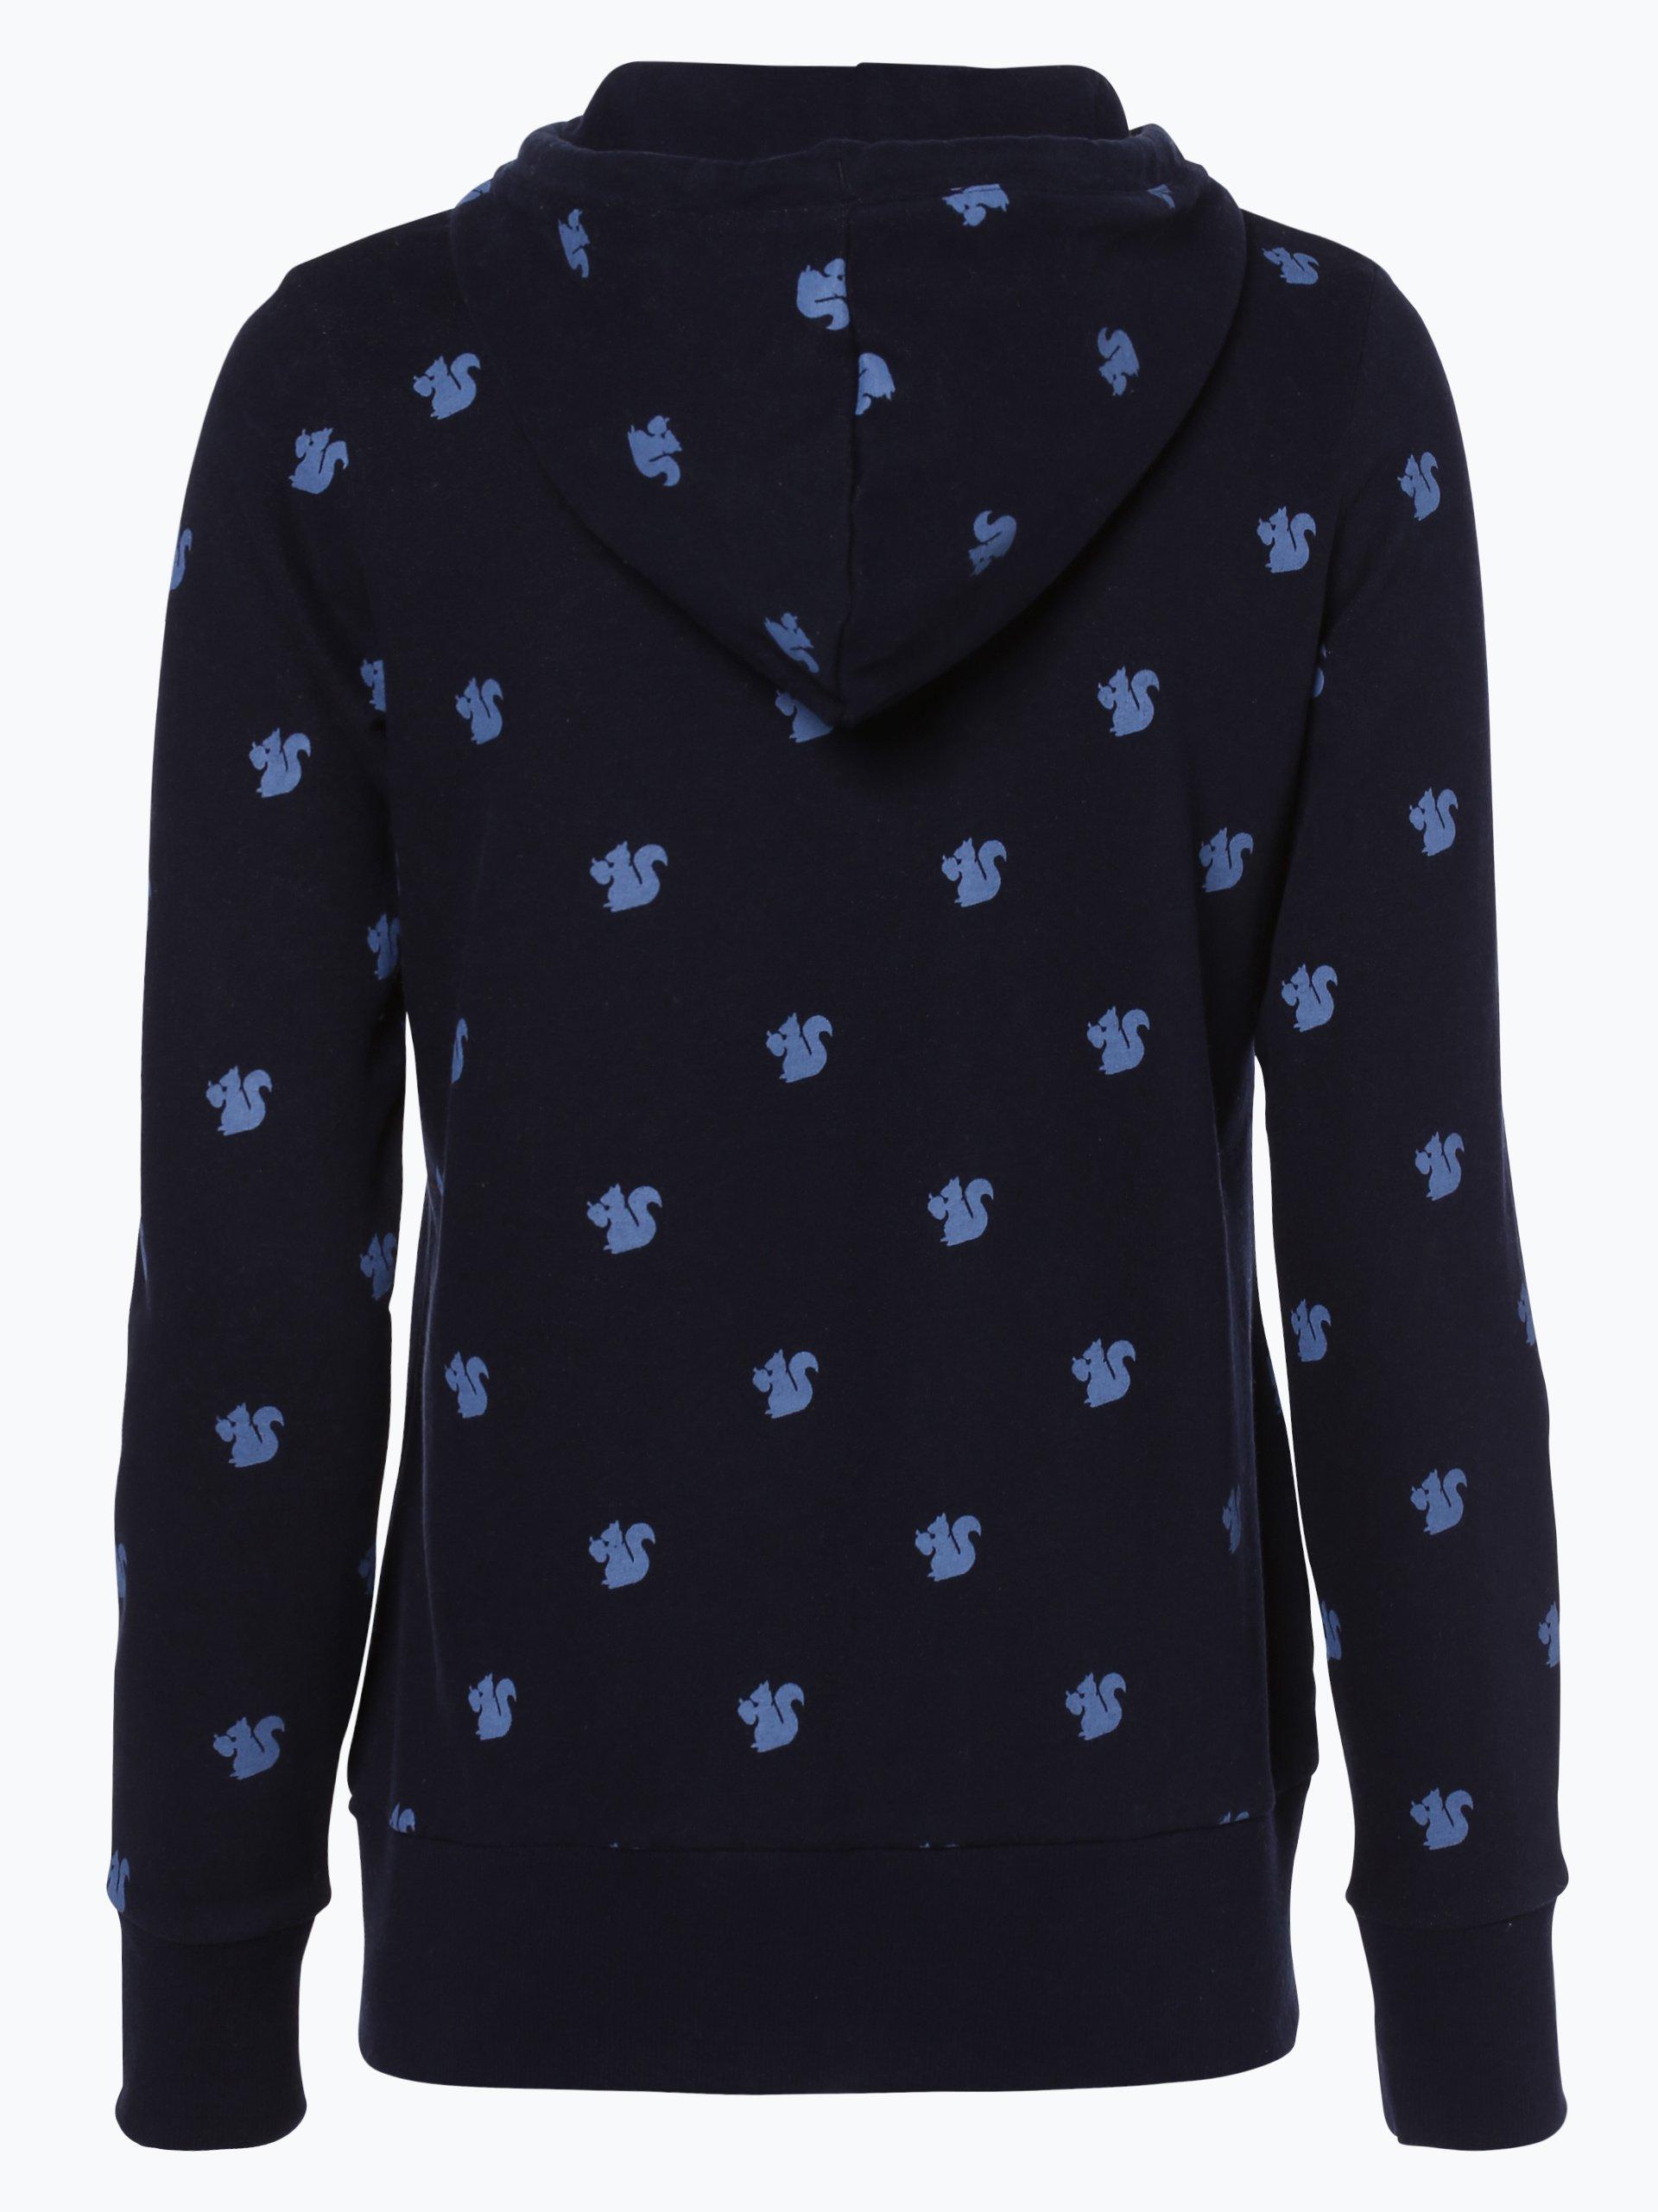 Marie Lund Damska bluza nierozpinana